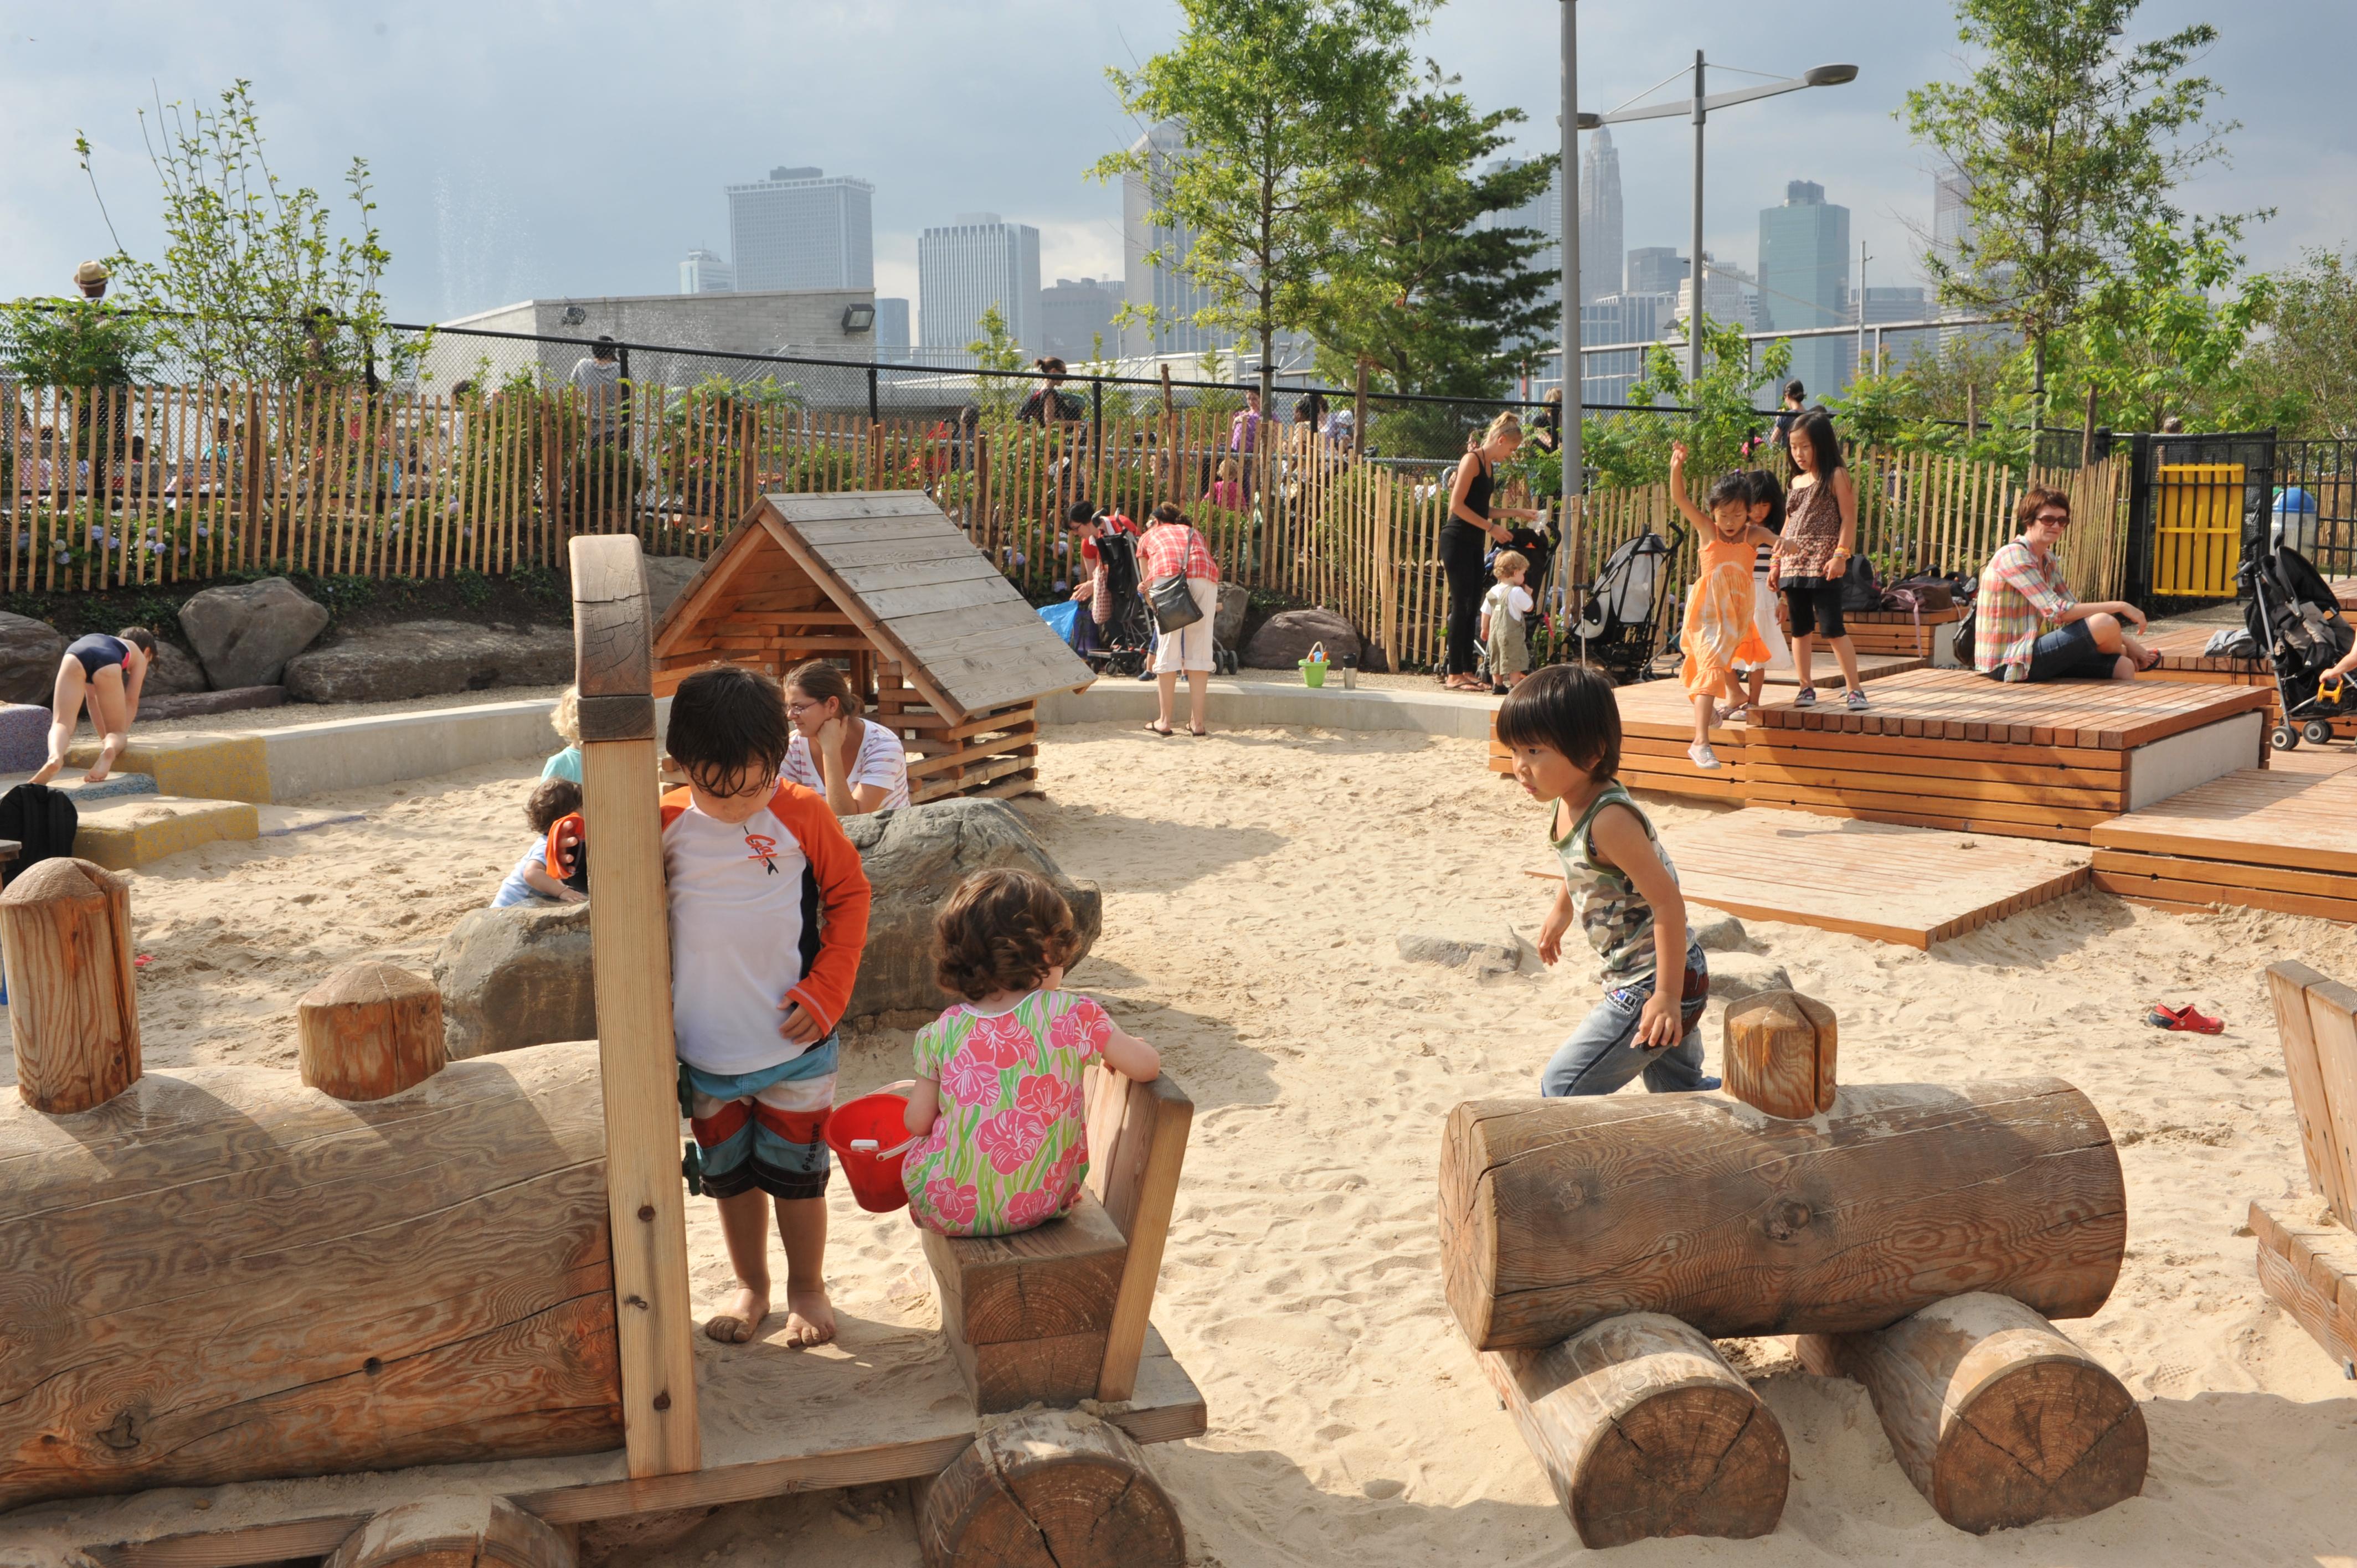 Top 10 Spots For Kids Brooklyn Bridge Park